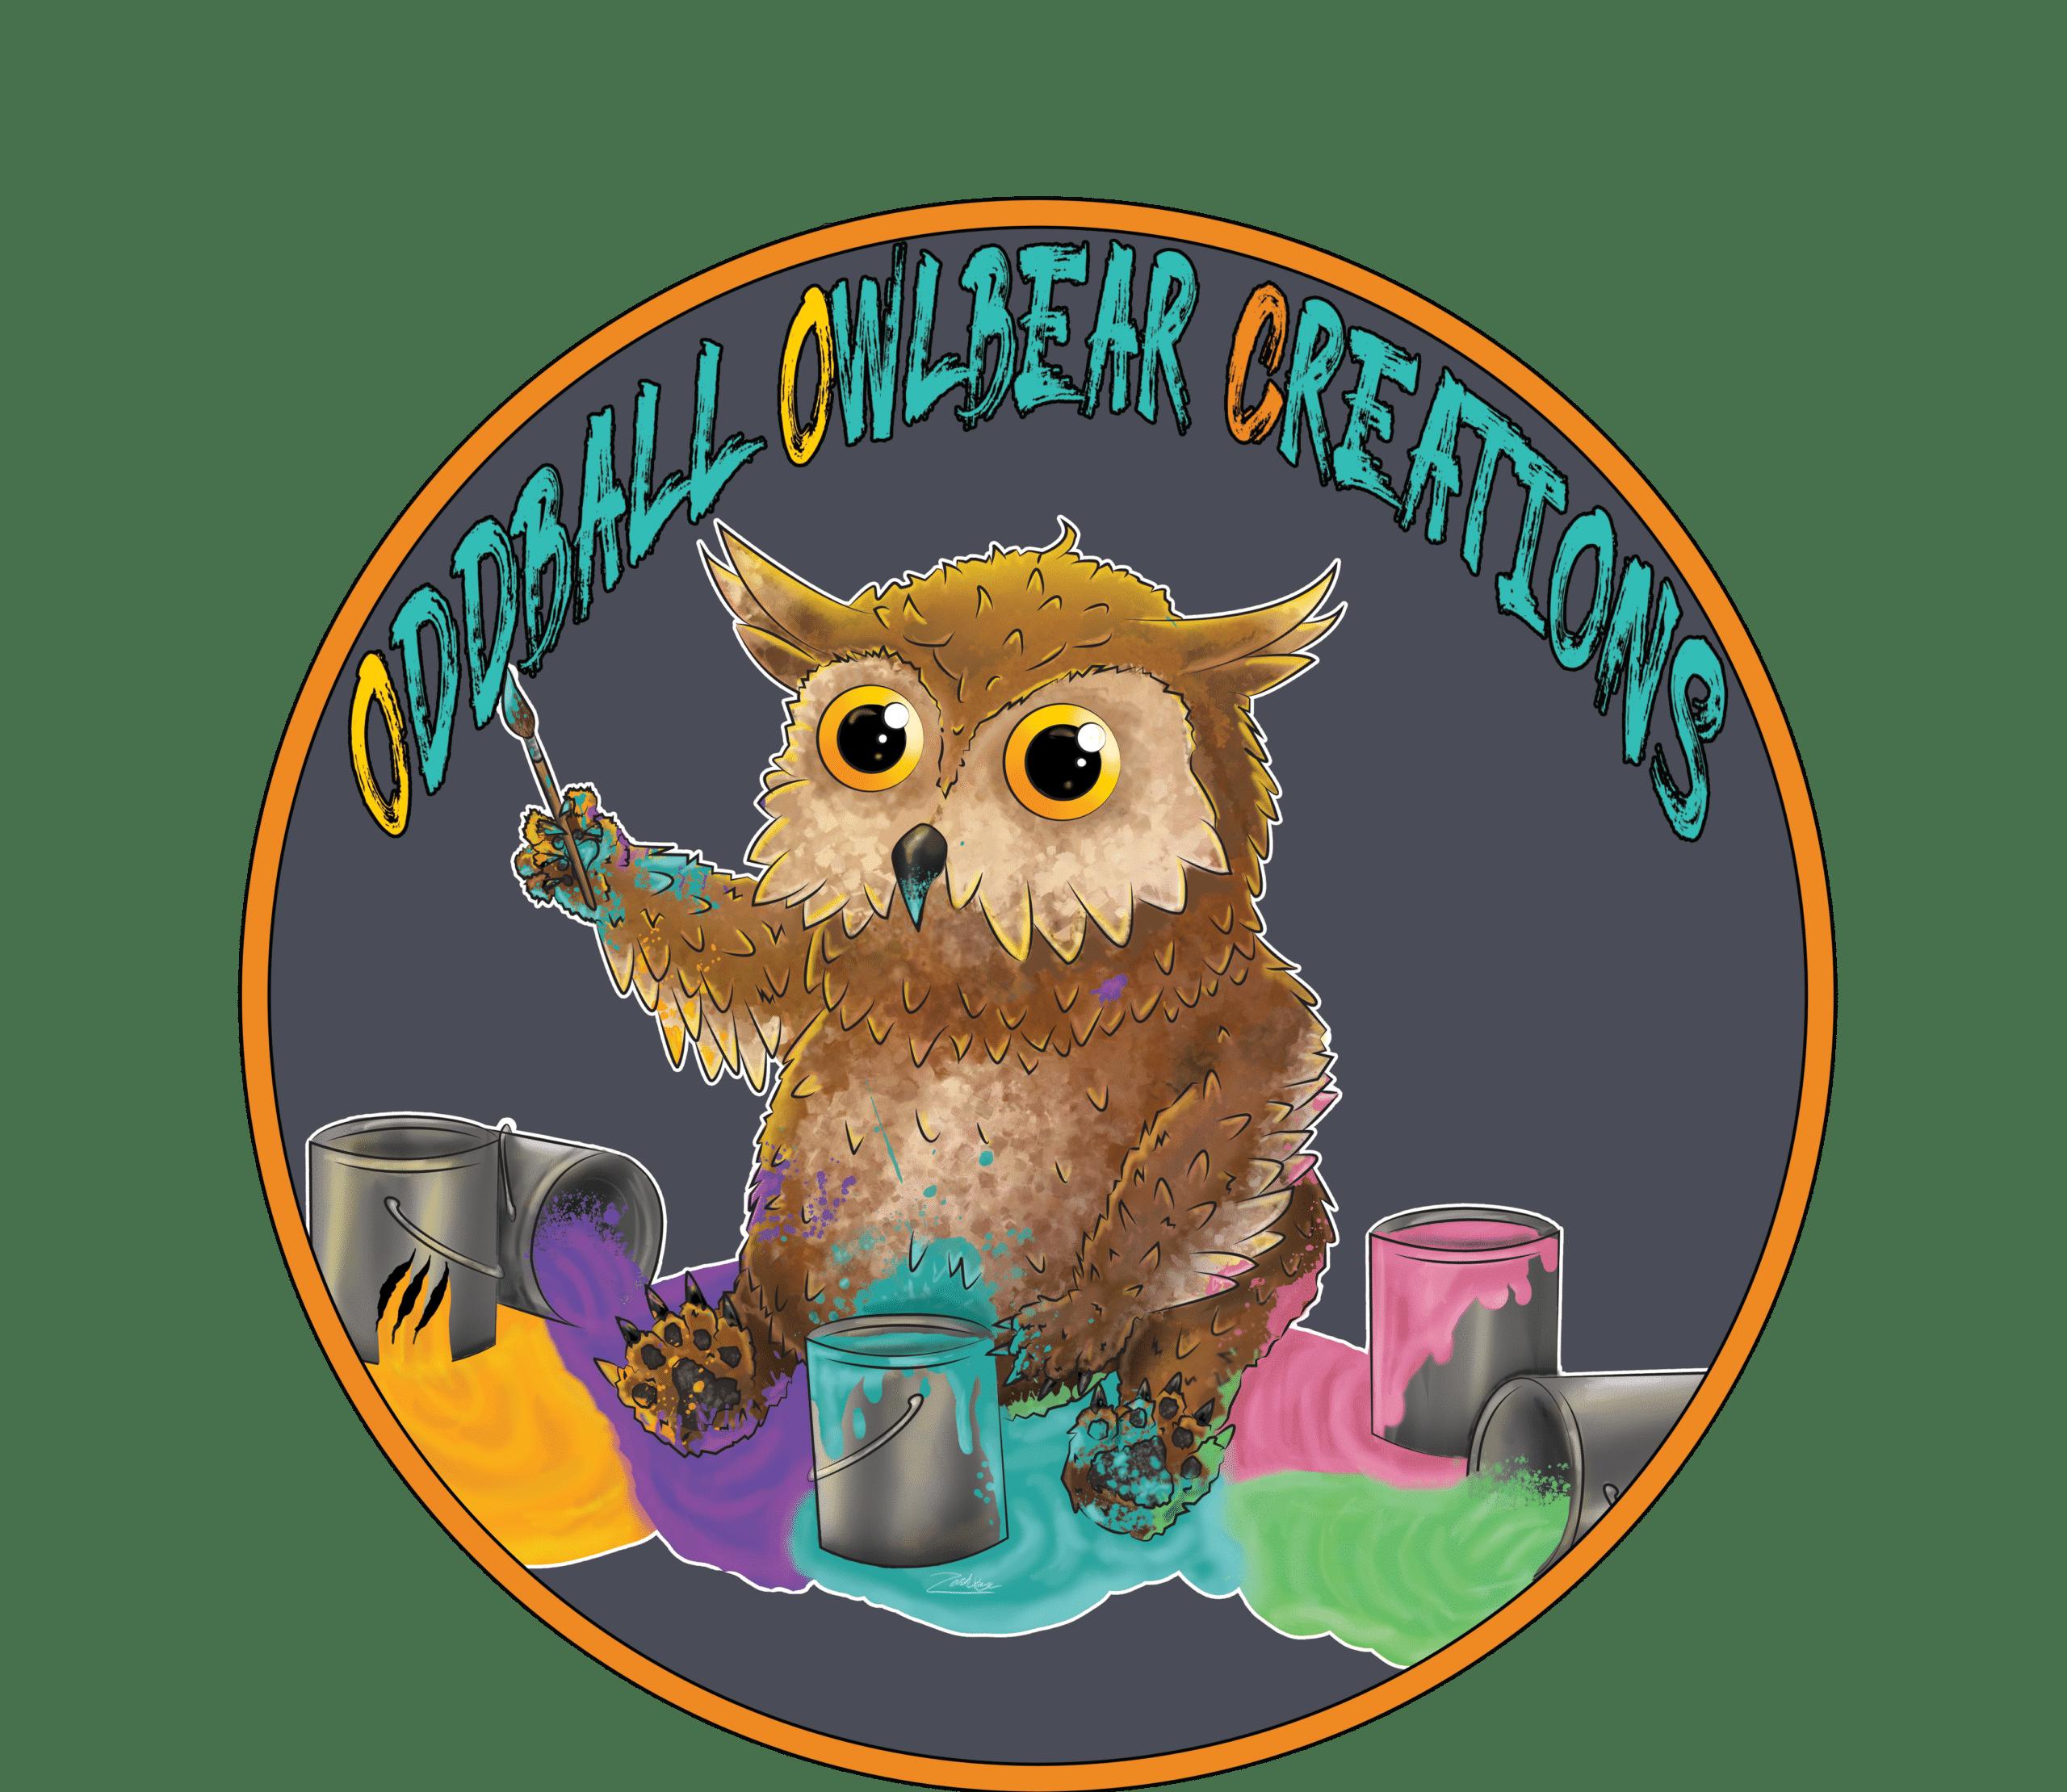 Oddball Owlbear Creations